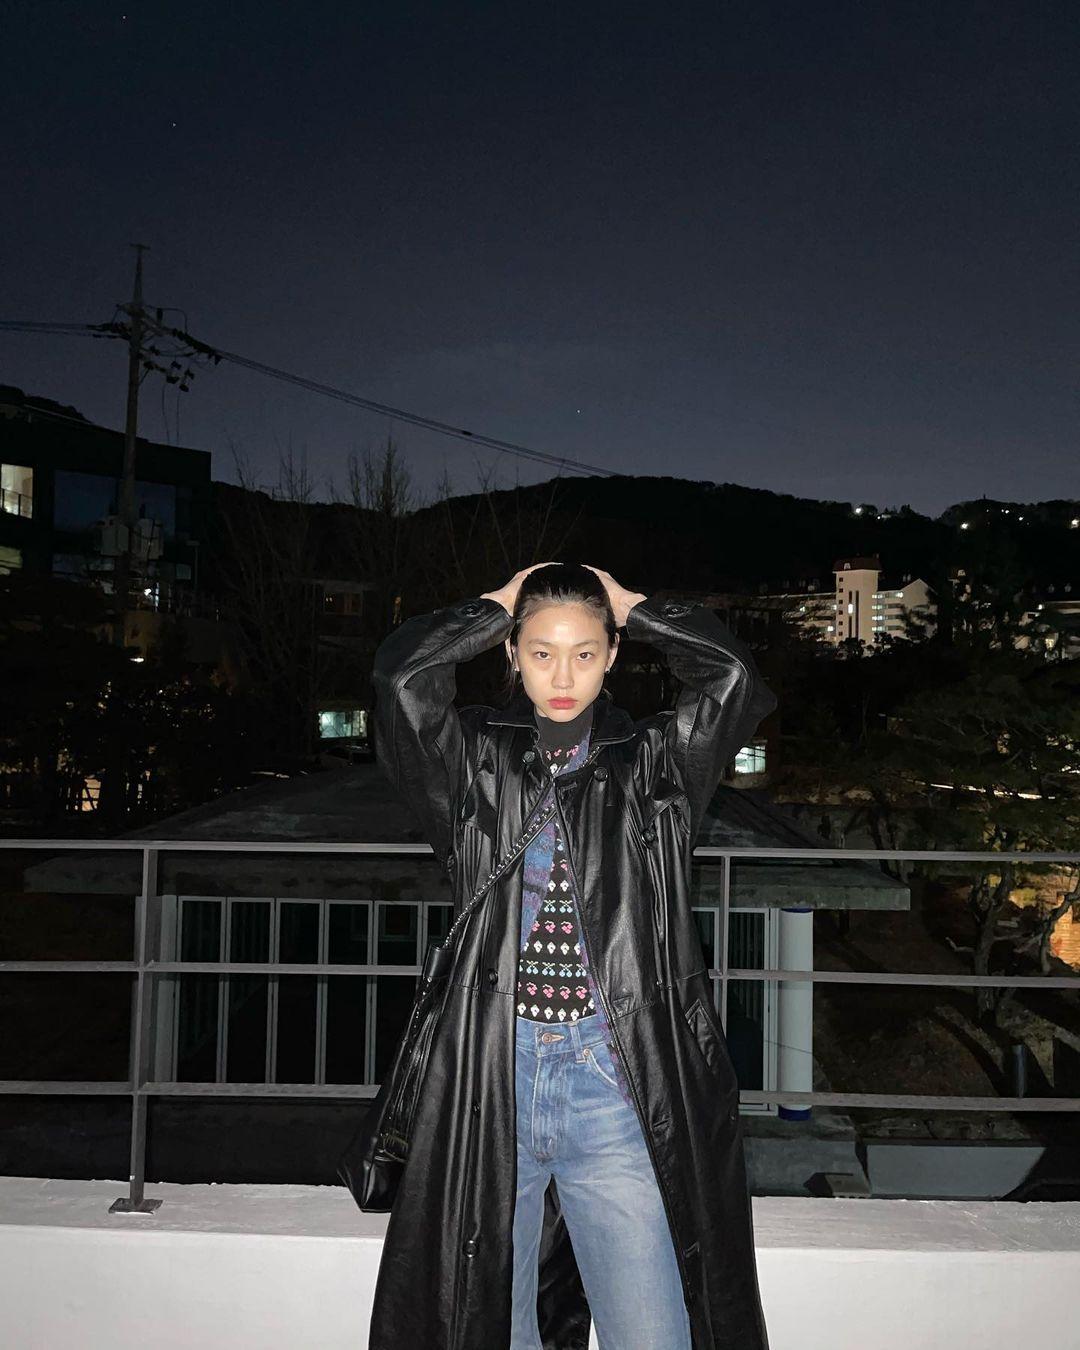 Potret Jung Ho Yeon 'Squid Game' yang Aslinya Modis Banget!